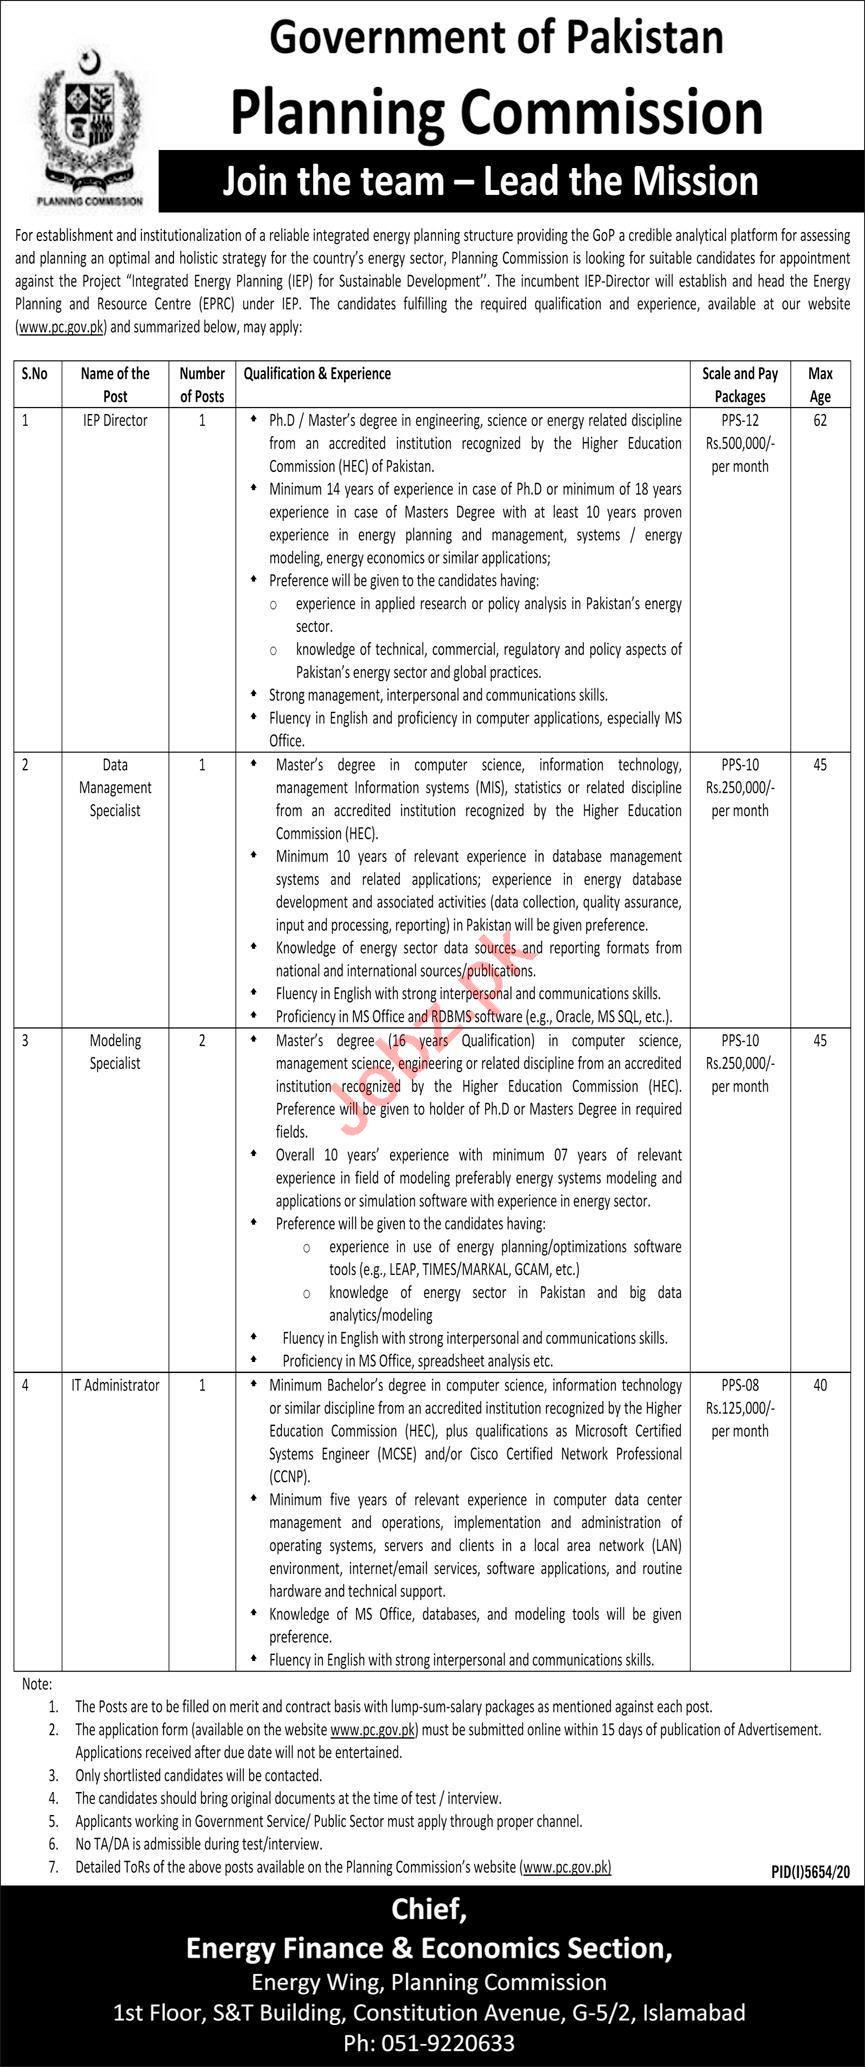 Energy Finance & Economics Section EFES Islamabad Jobs 2021